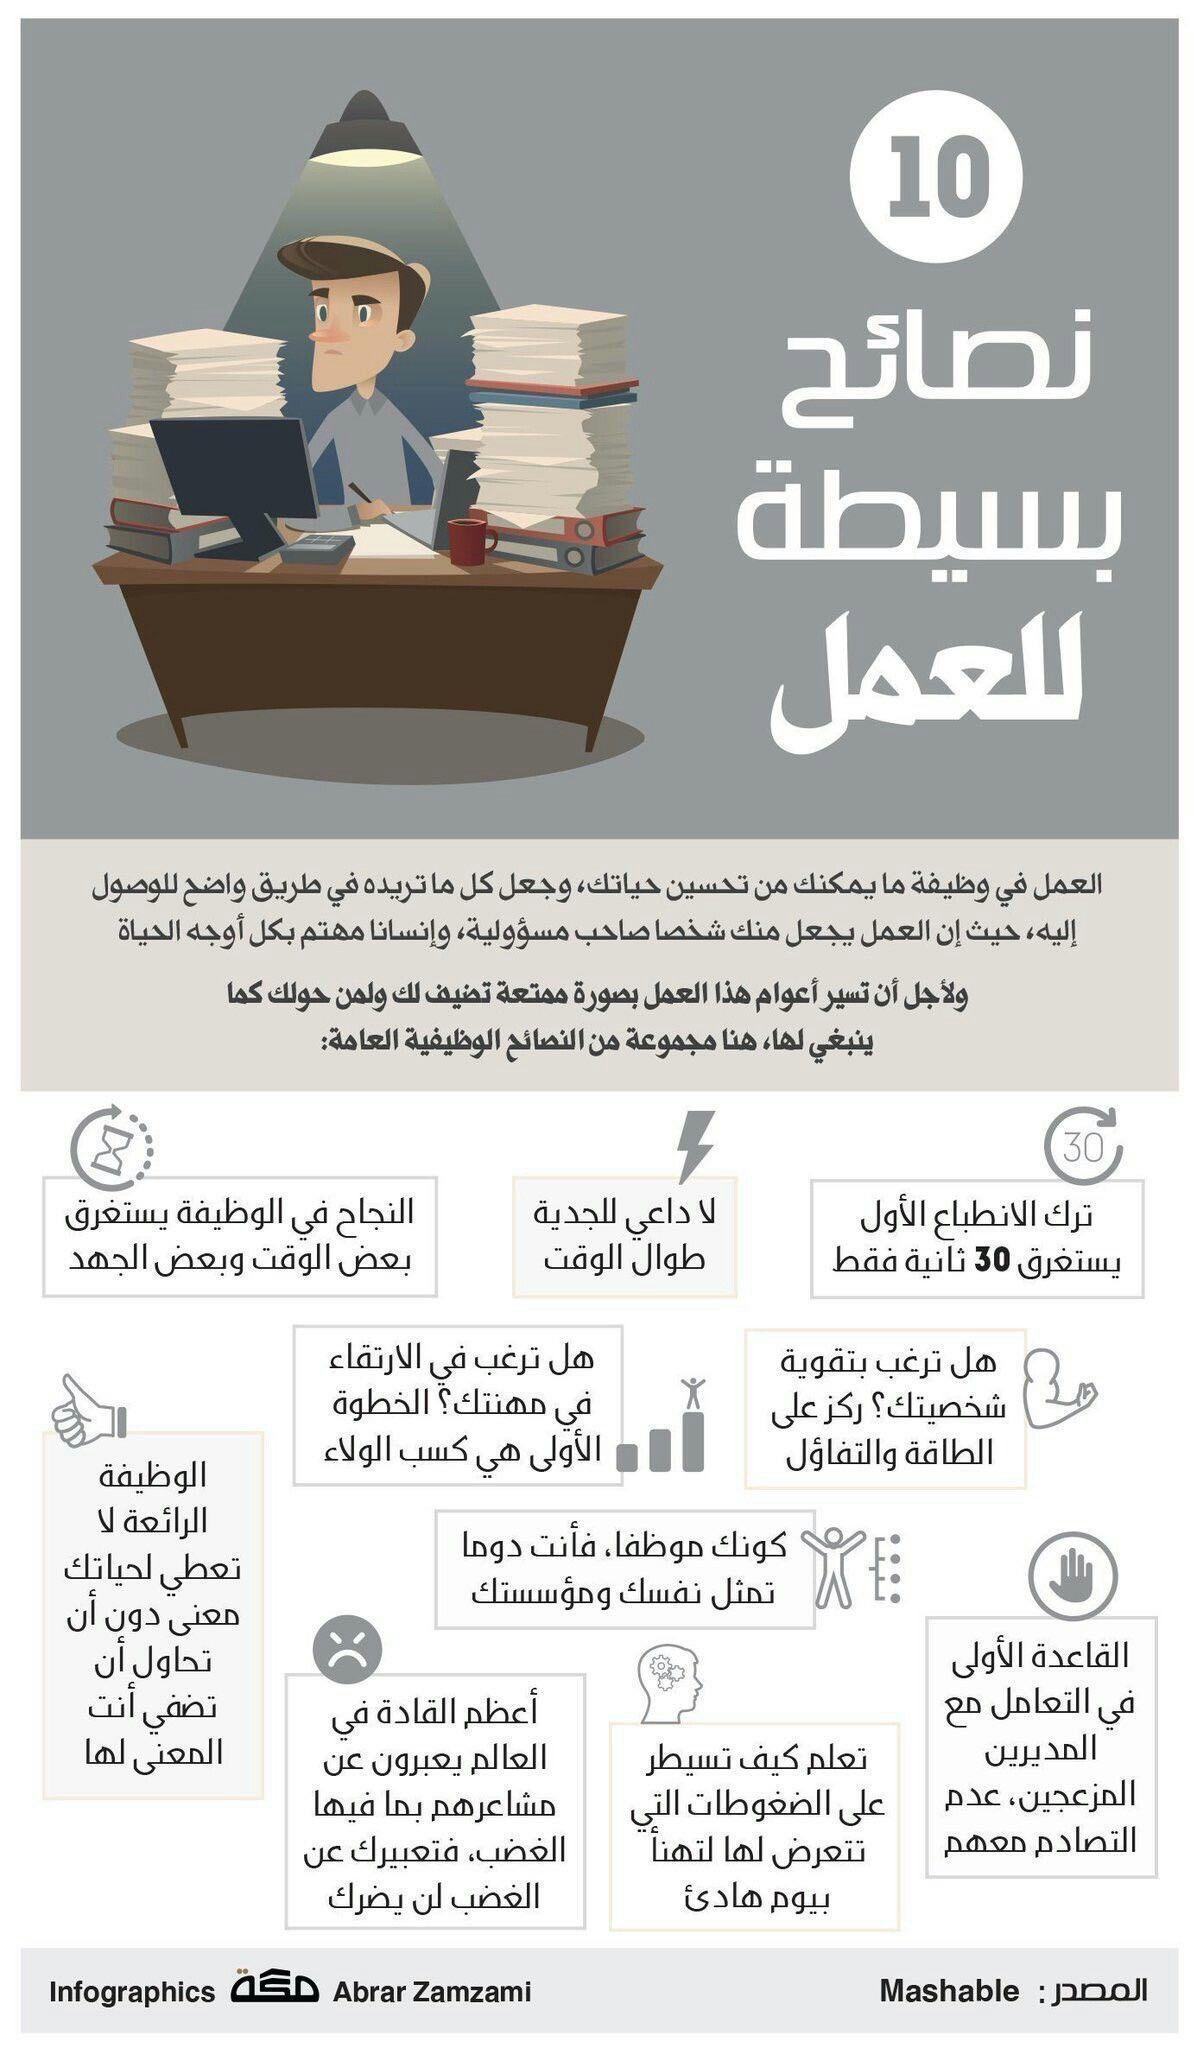 Pin By Esraa Magdy On Informatiq Life Skills Activities Work Goals Work Skills